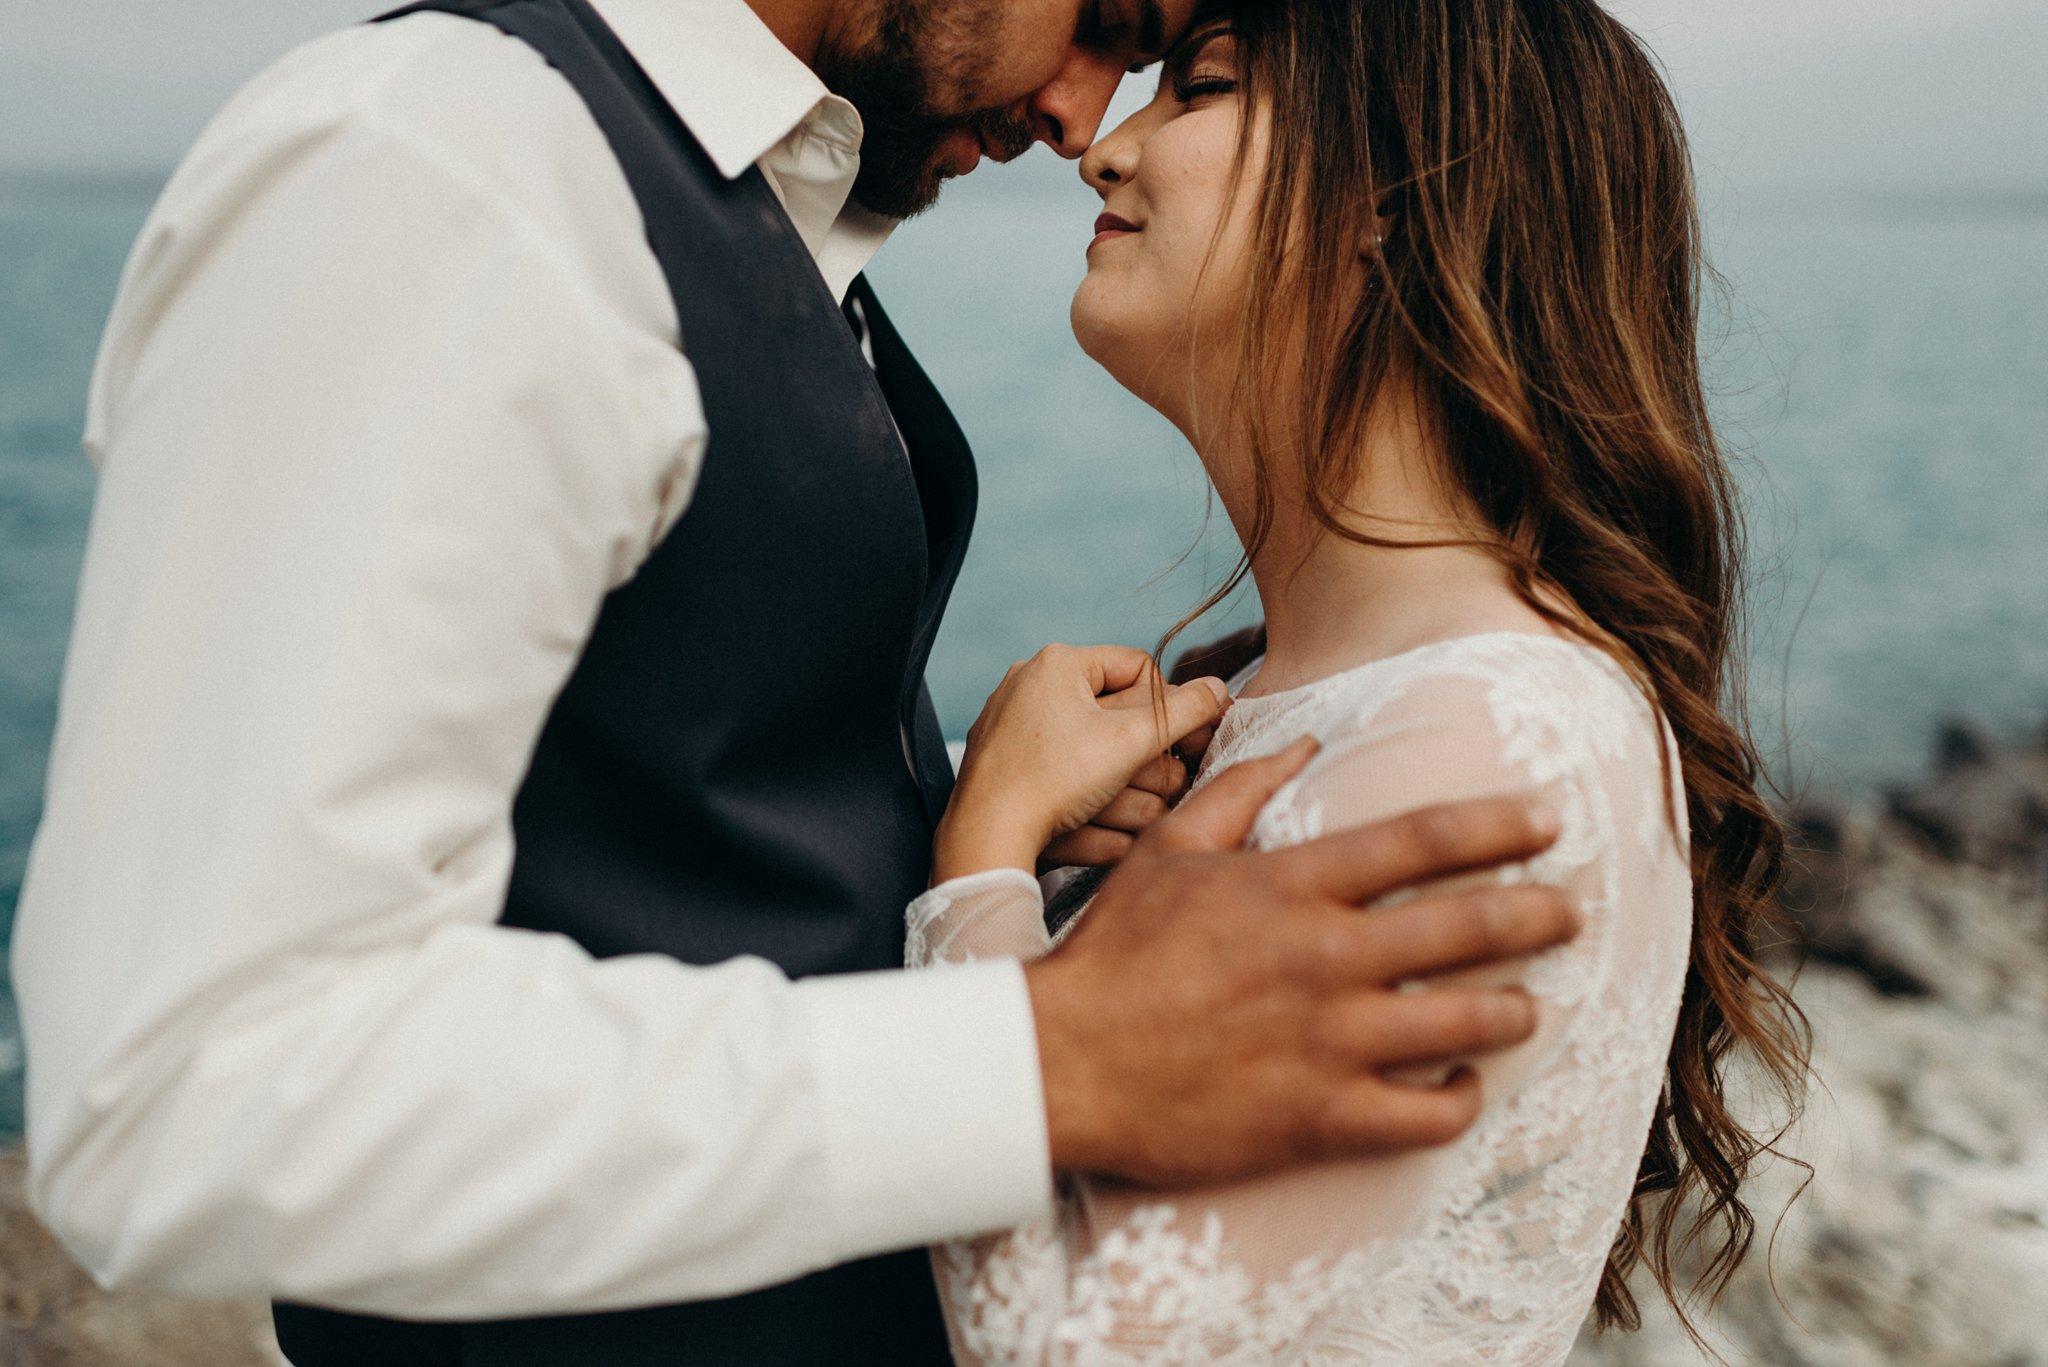 kaihla_tonai_intimate_wedding_elopement_photographer_6755.jpg